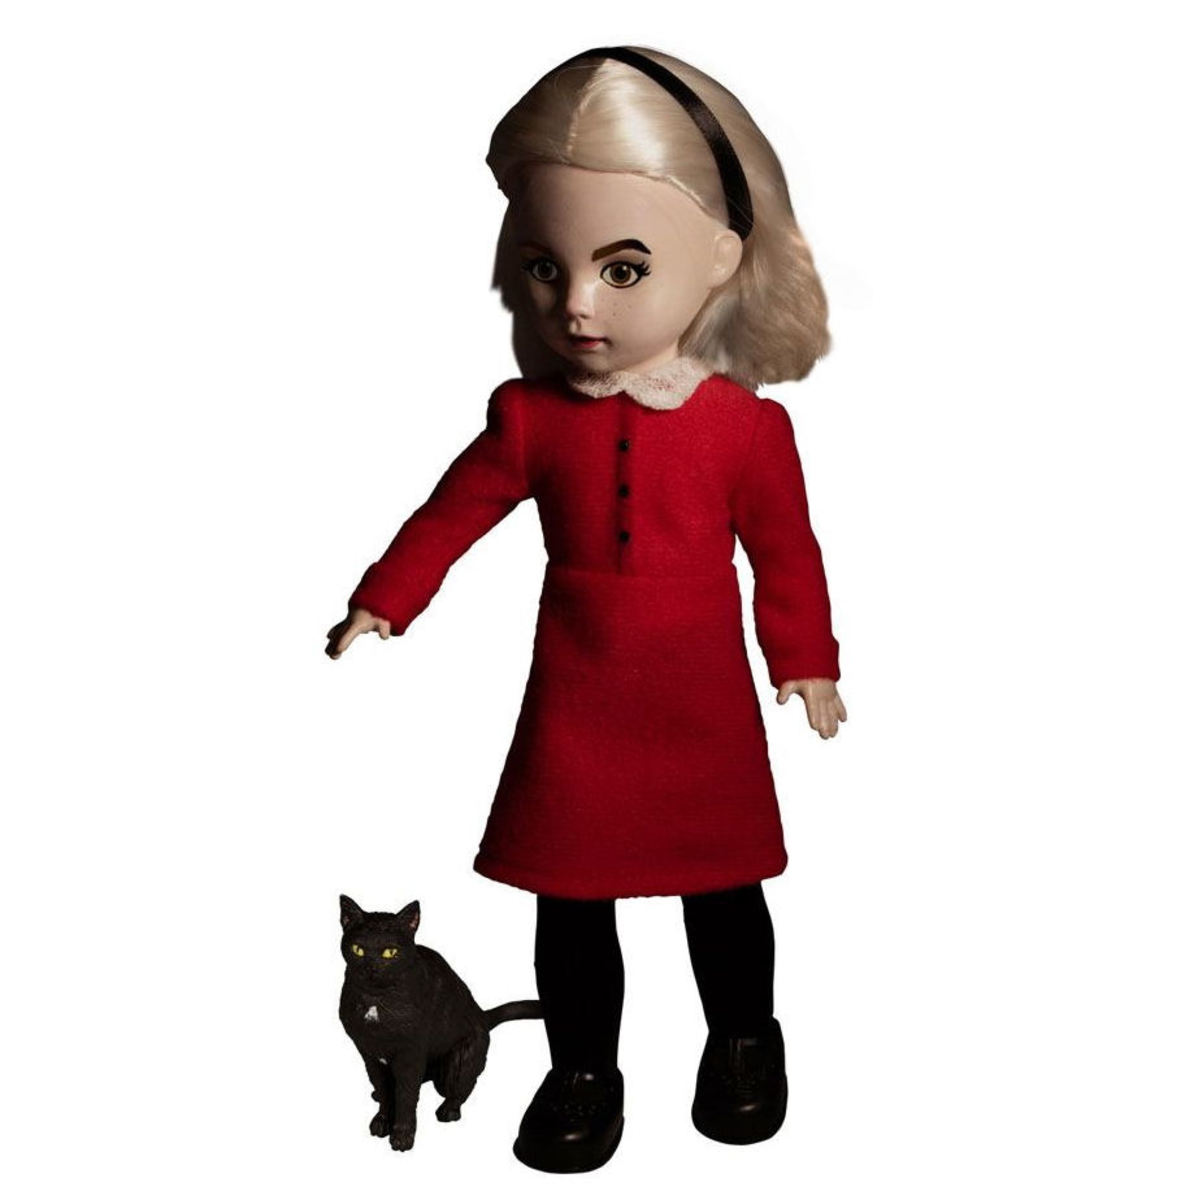 bábika Chilling Adventures of Sabrina - Living Dead Dolls - Sabrina - MEZ99599